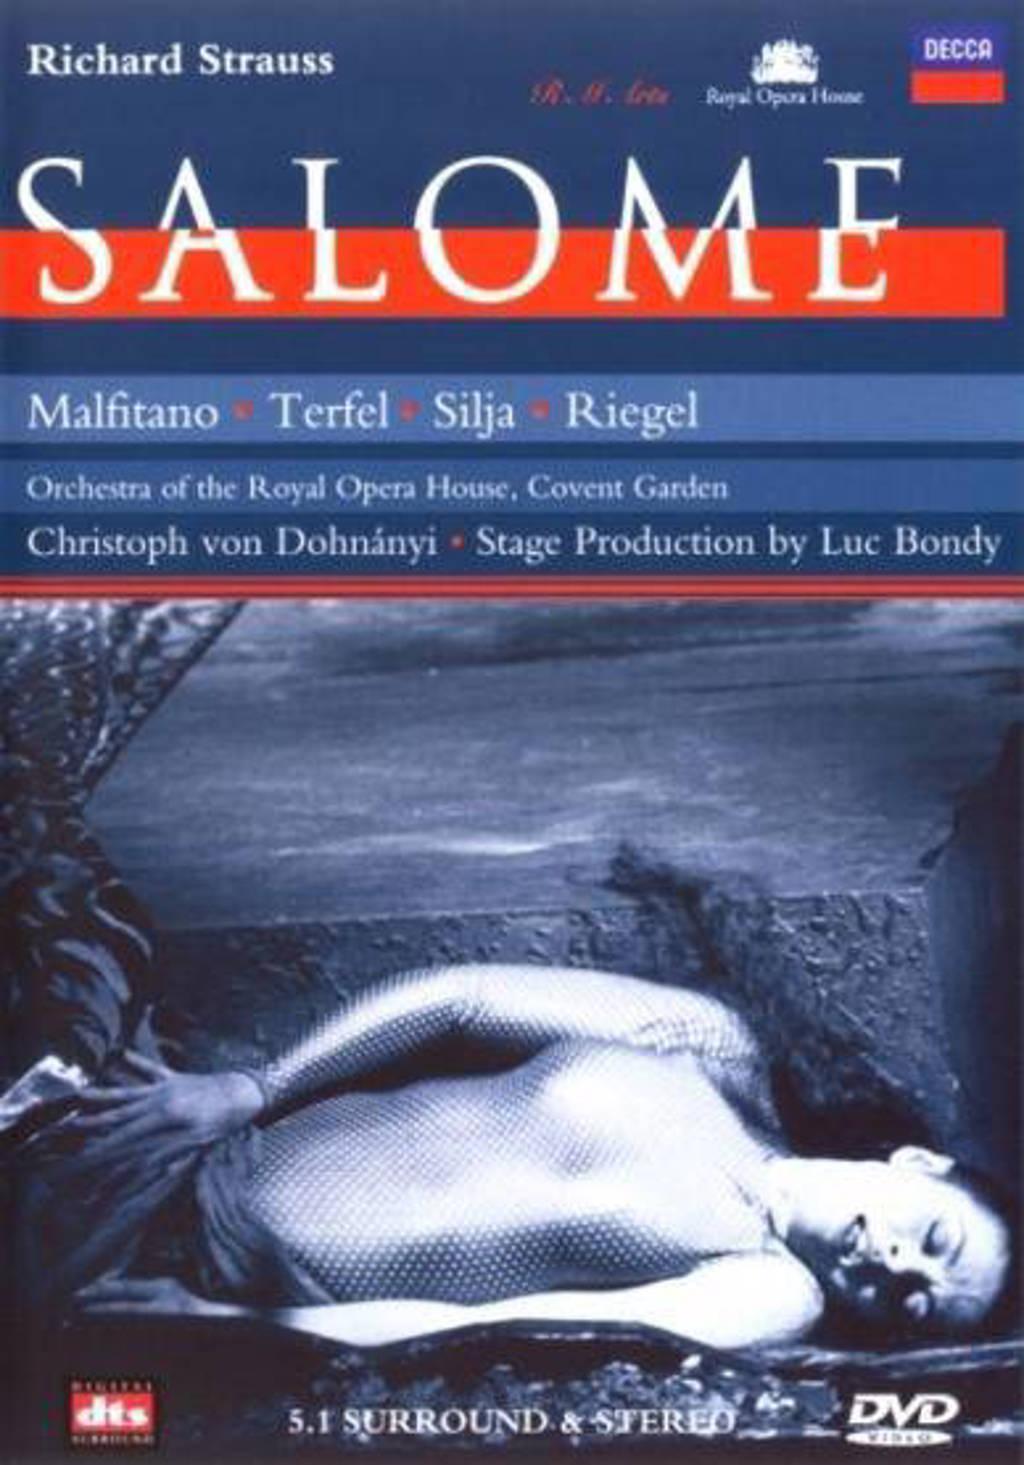 Strauss - Salome (DVD)